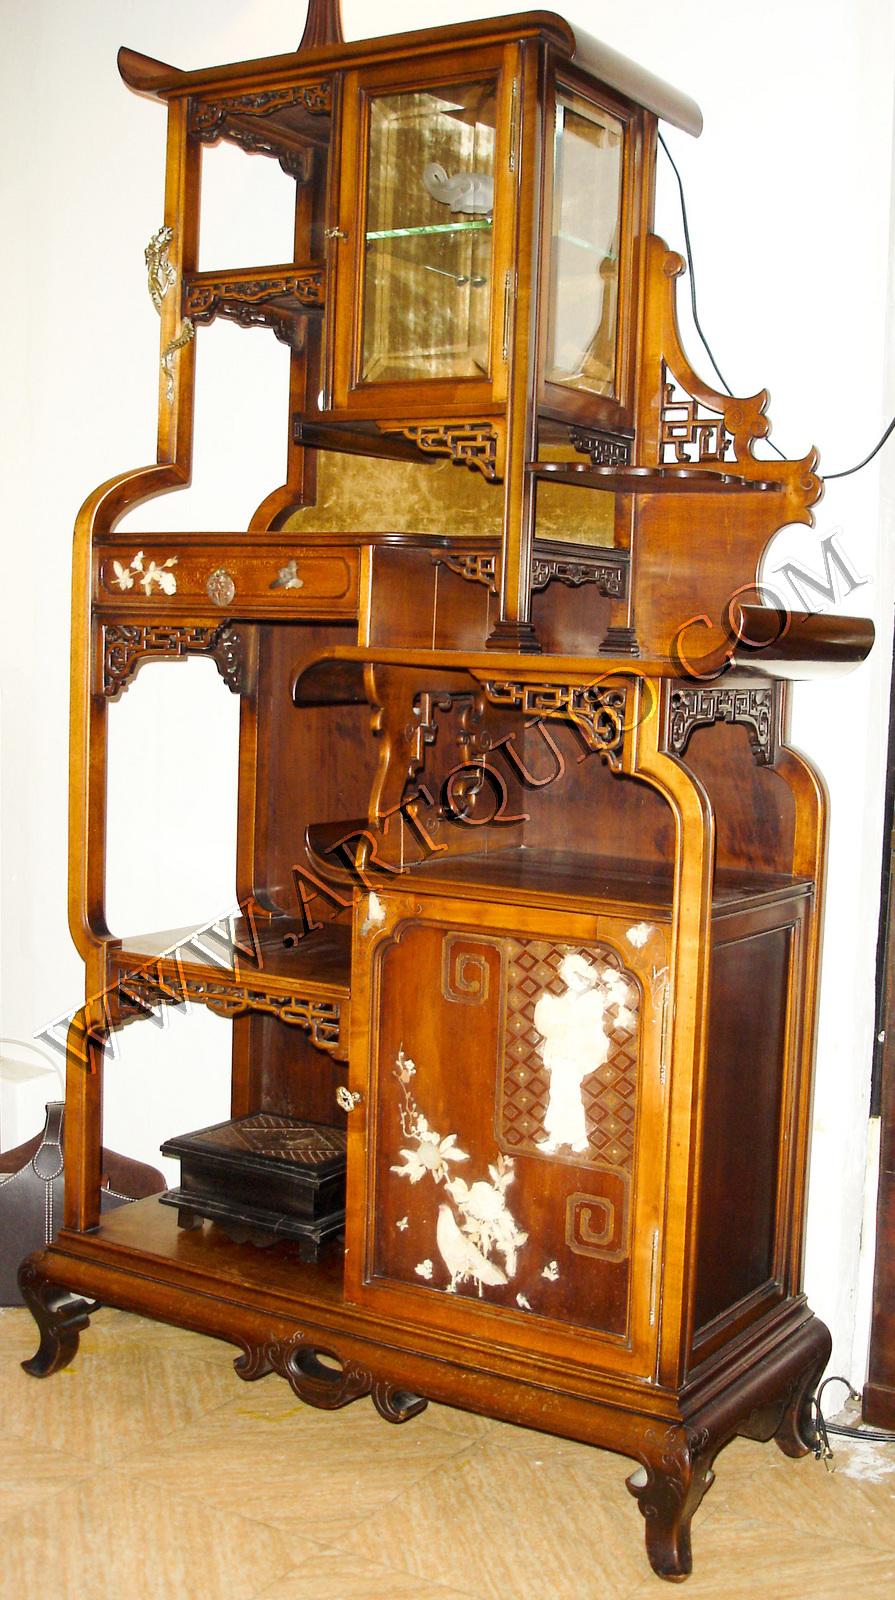 blue folding chairs ballard designs dining japan   history of design through the 18th century